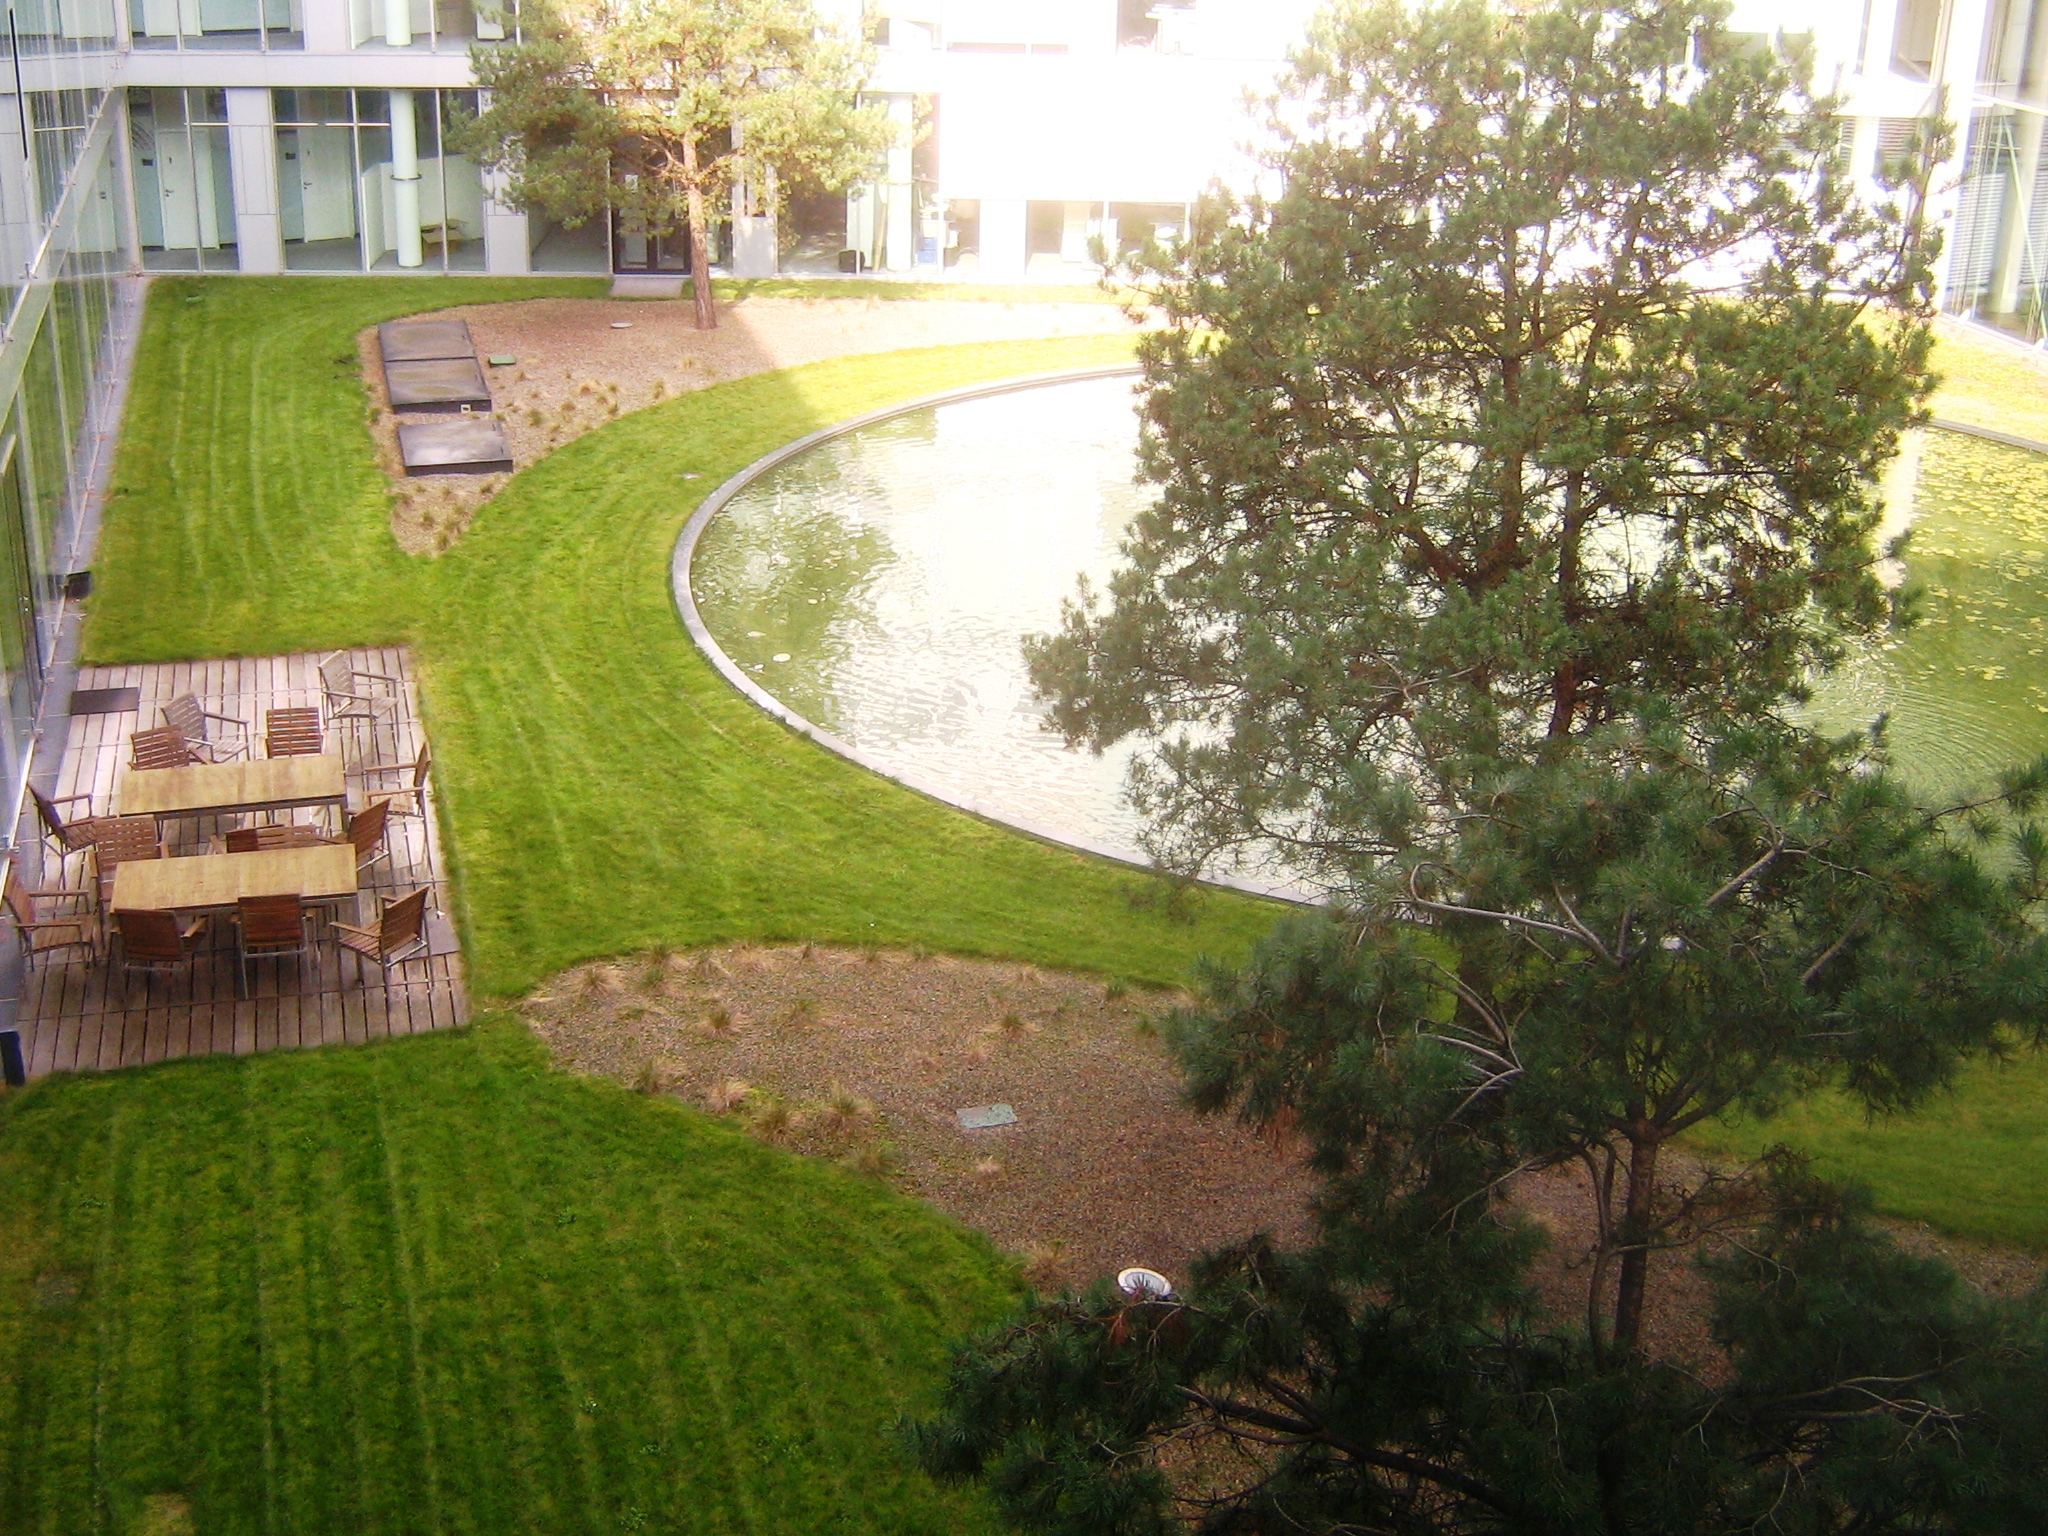 File:T-Mobile HQ Internal Yard - panoramio jpg - Wikimedia Commons